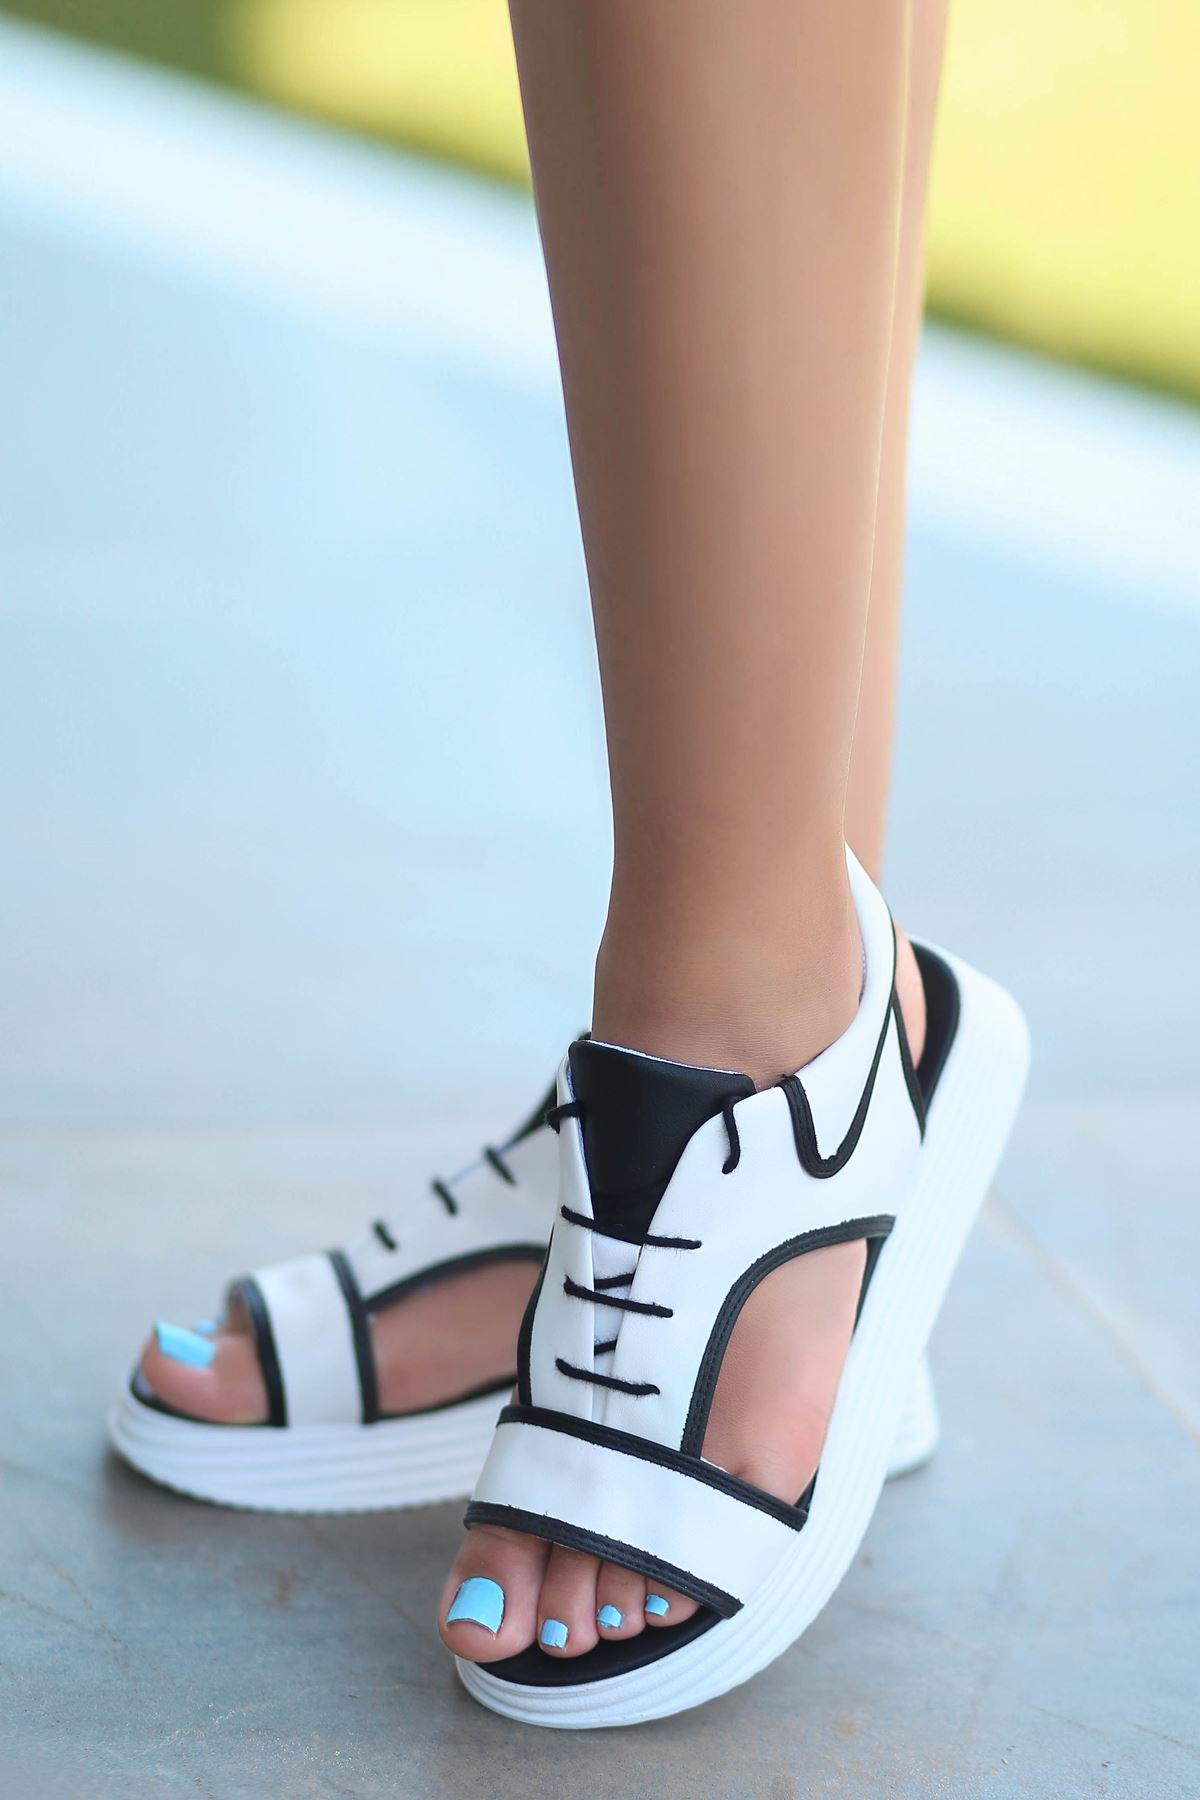 Lace Mat Deri Bağcık Detay Sandalet Siyah